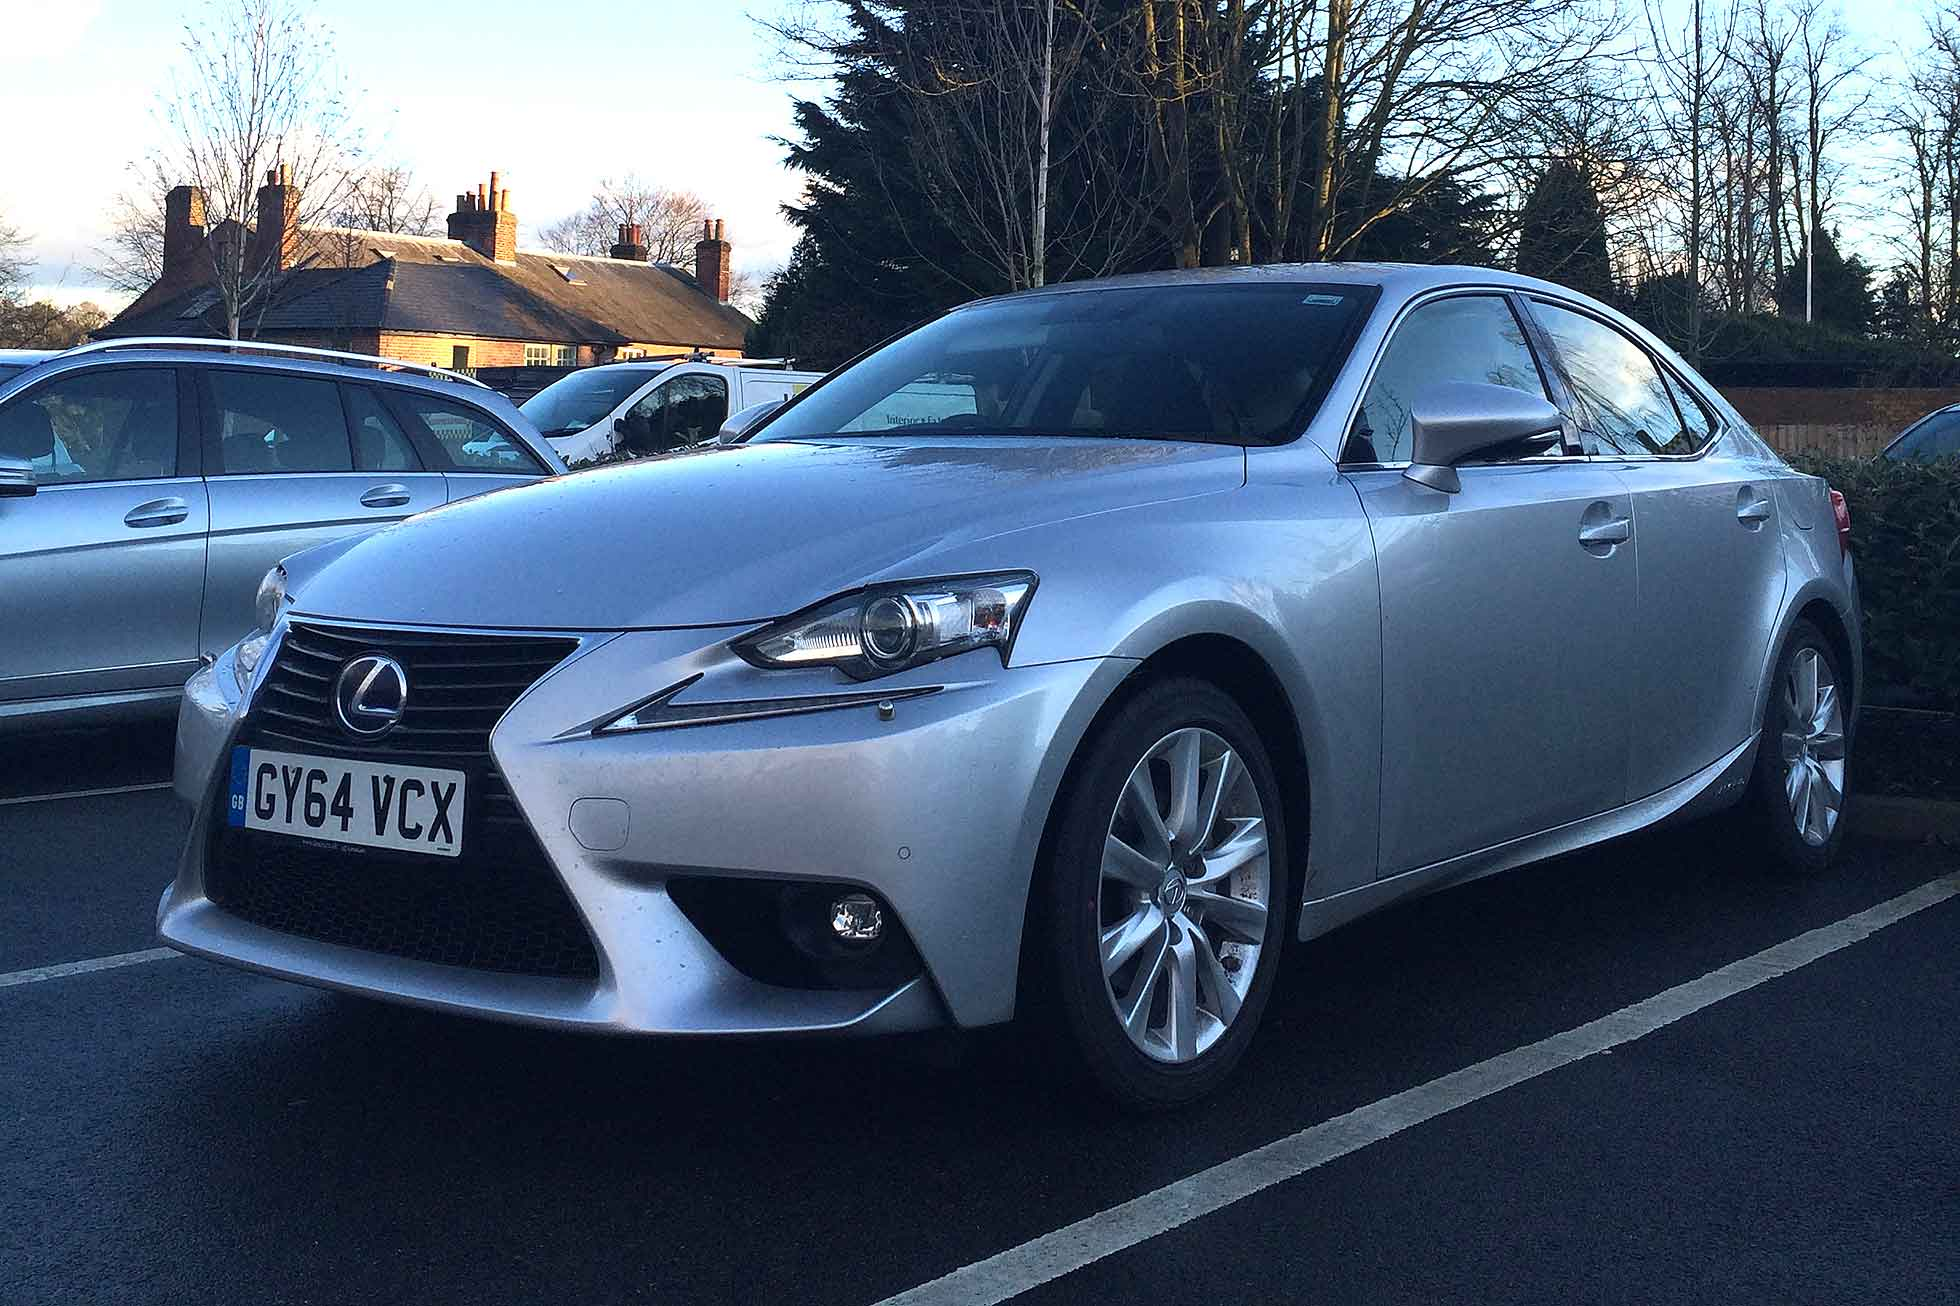 Lexus IS 300h (2015) long-term review | Motoring Research